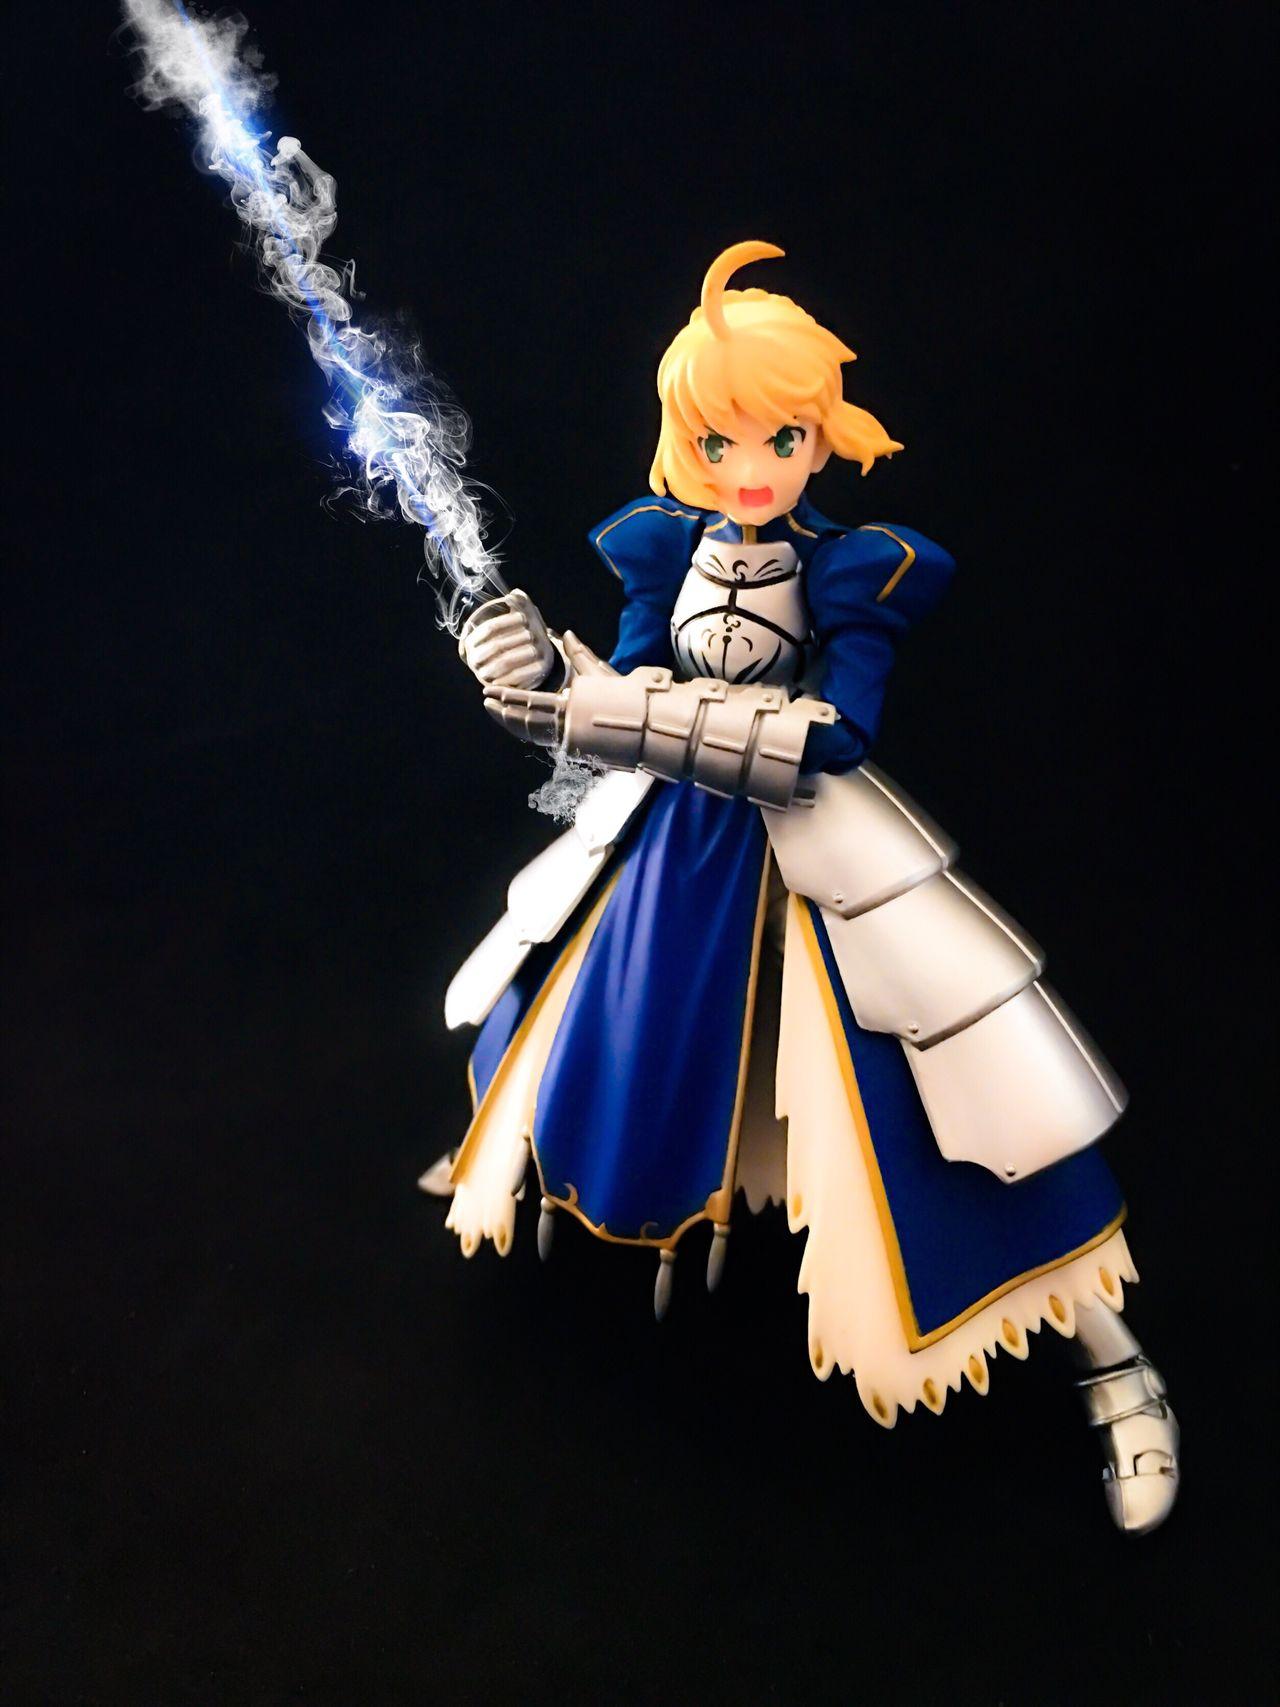 Saber fate zero Toyphotography Actionfigures Actionfigurephotography Saberfatezero FateStayNight Anime Otaku